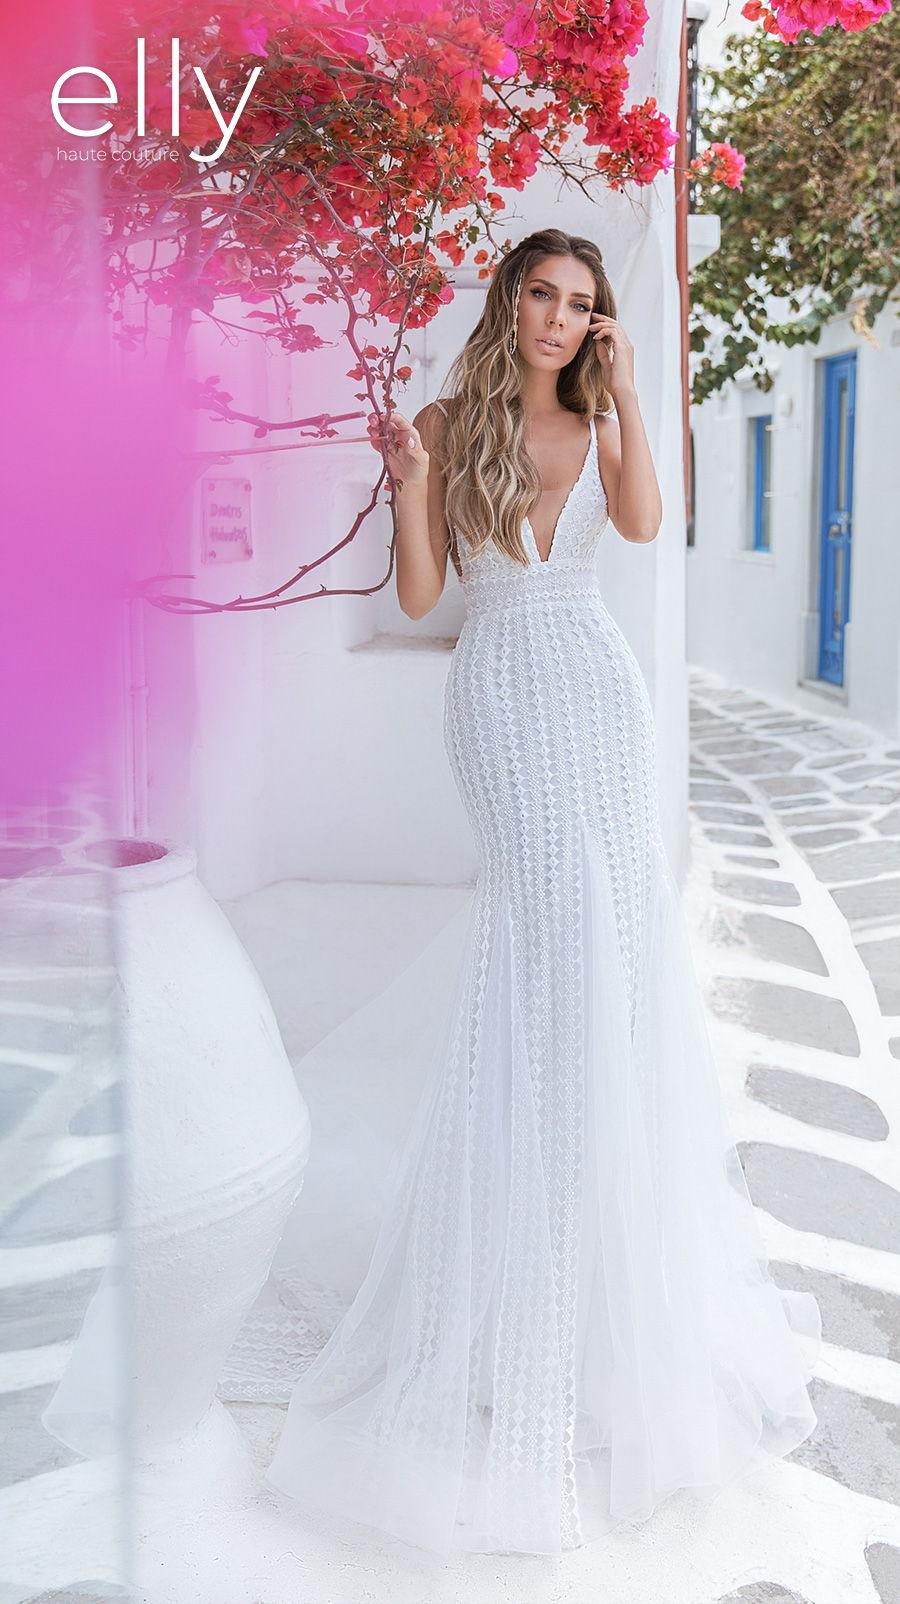 elly bride 2020 white mykonos bridal sleeveless thin strap deep v neck full embellishment elegant sexy fit and flare wedding dress low v back medium train (daisy) mv